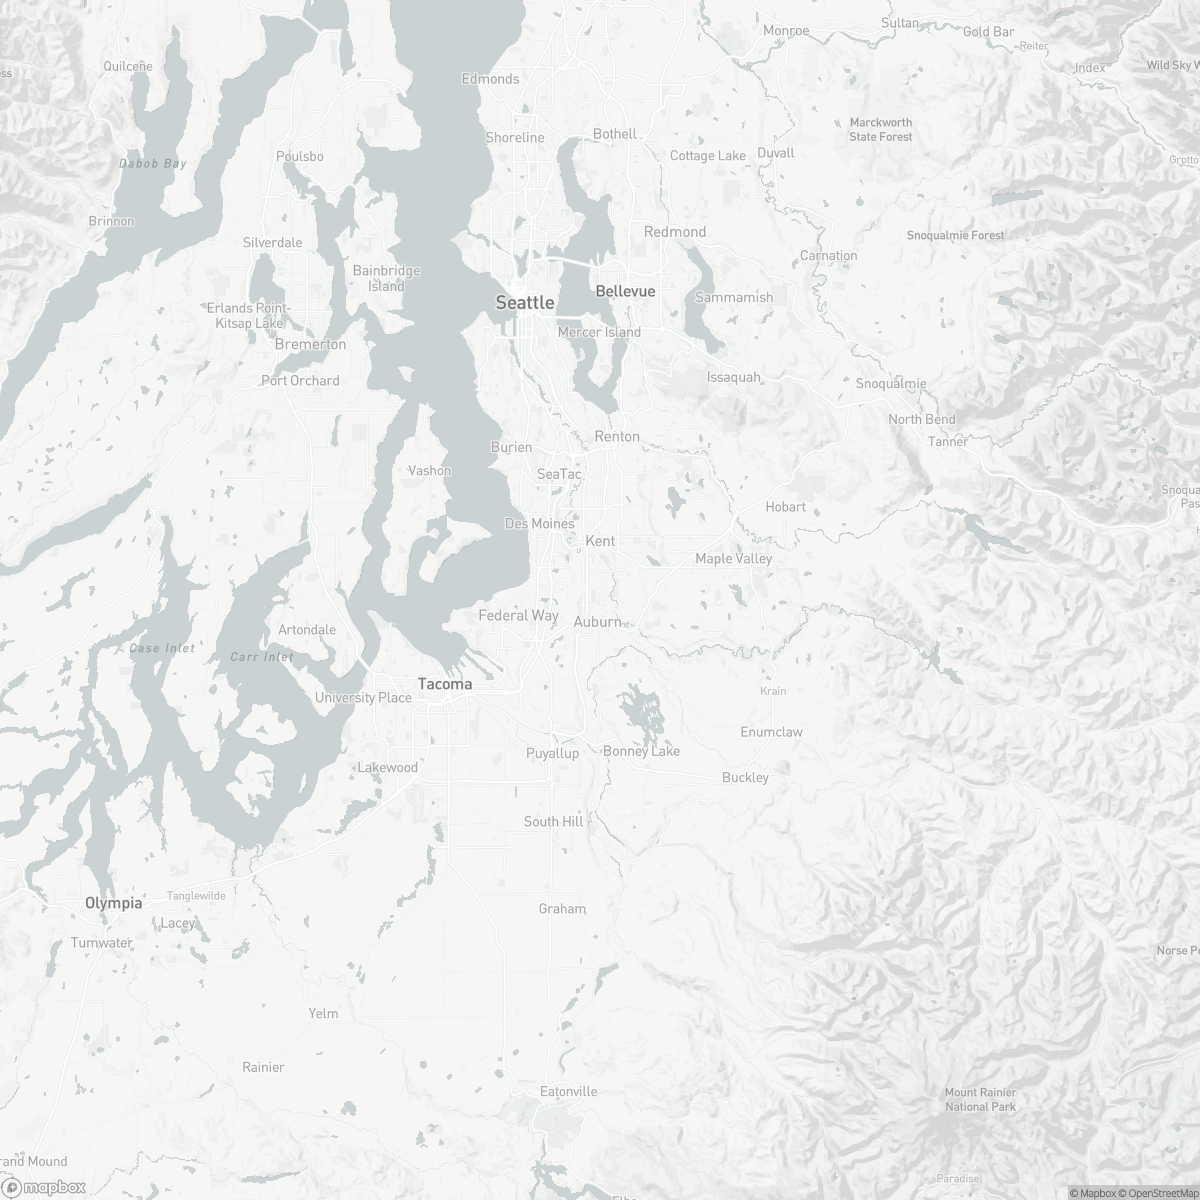 Map of Auburn Municipal Airport S50 surrounding area of Auburn Washington